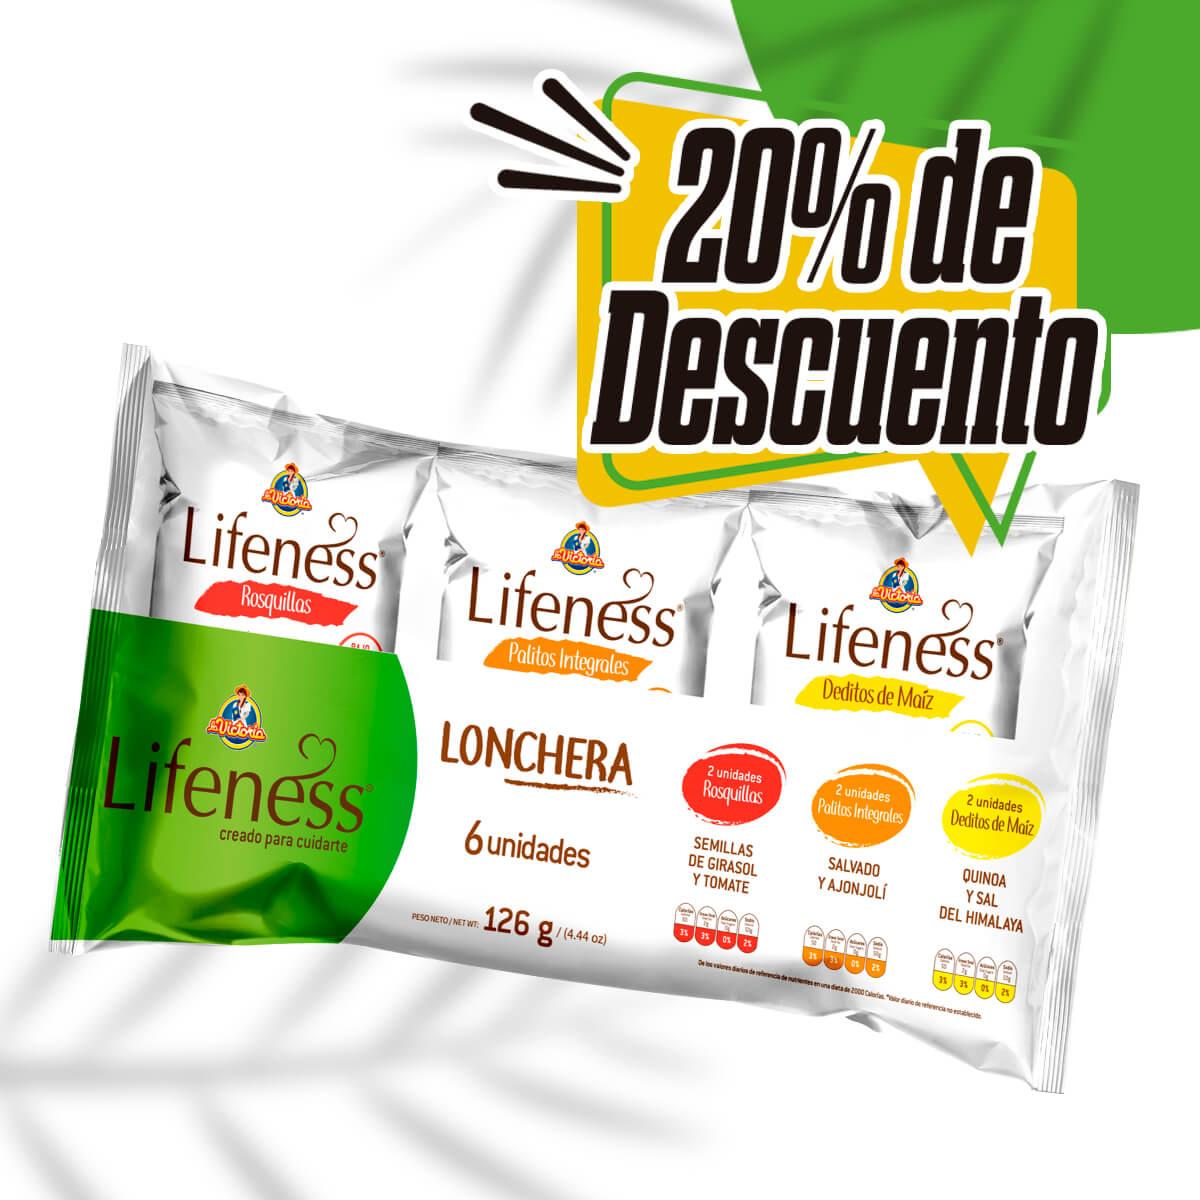 Lonchera Lifeness 126 gr. (Display x 6 UND.)_3